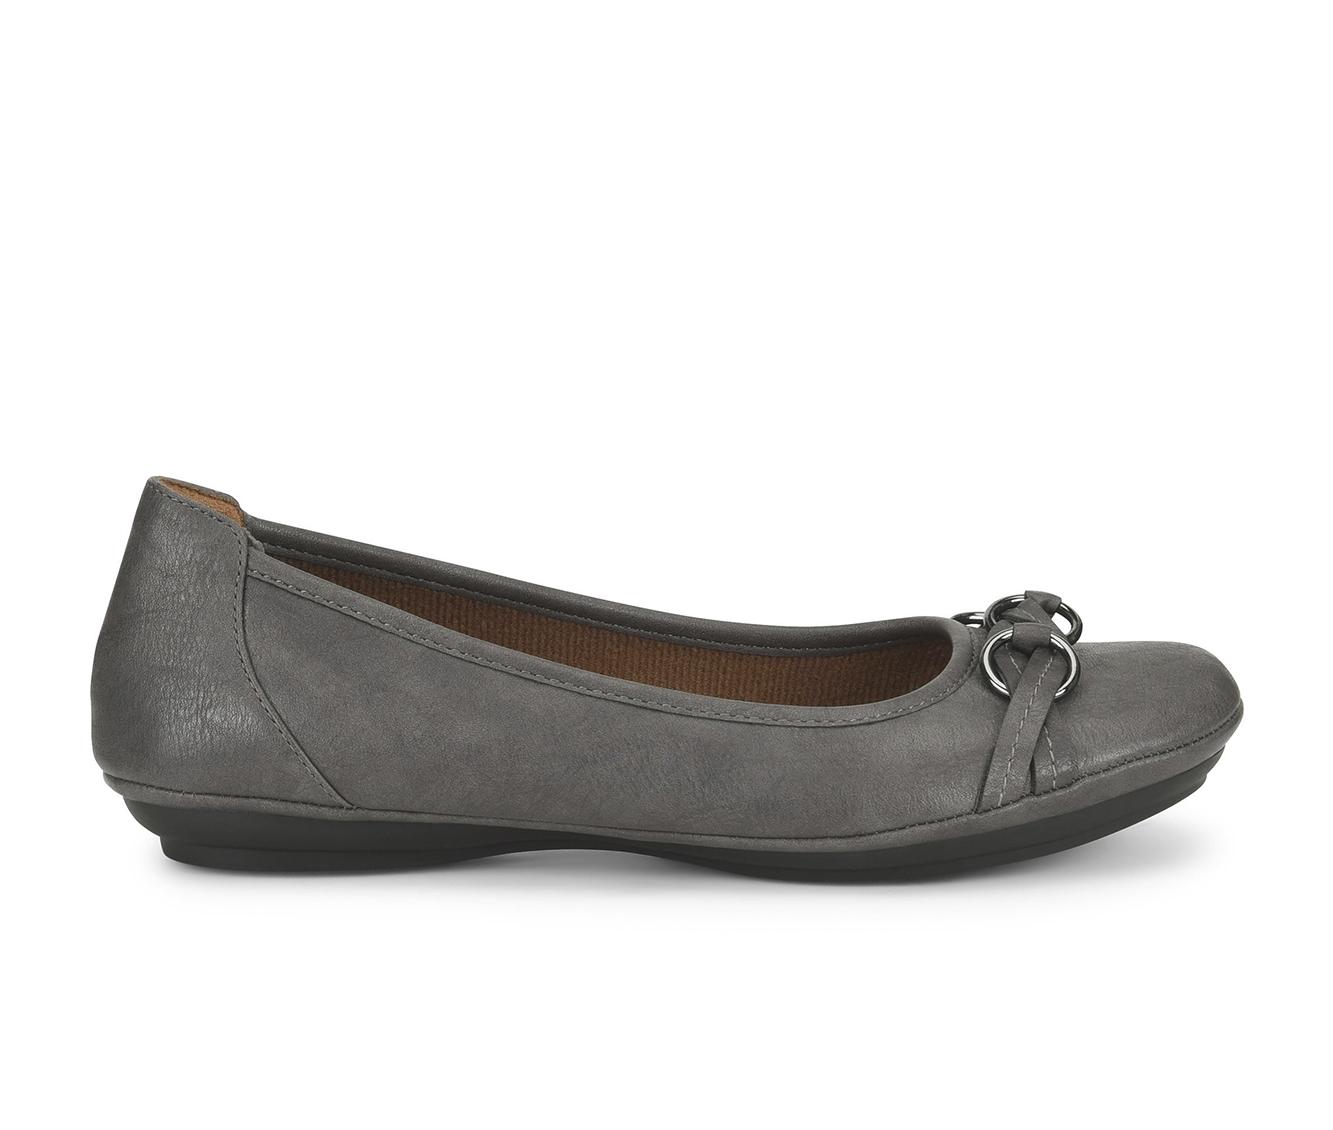 EuroSoft Sabana Women's Shoe (Gray Faux Leather)